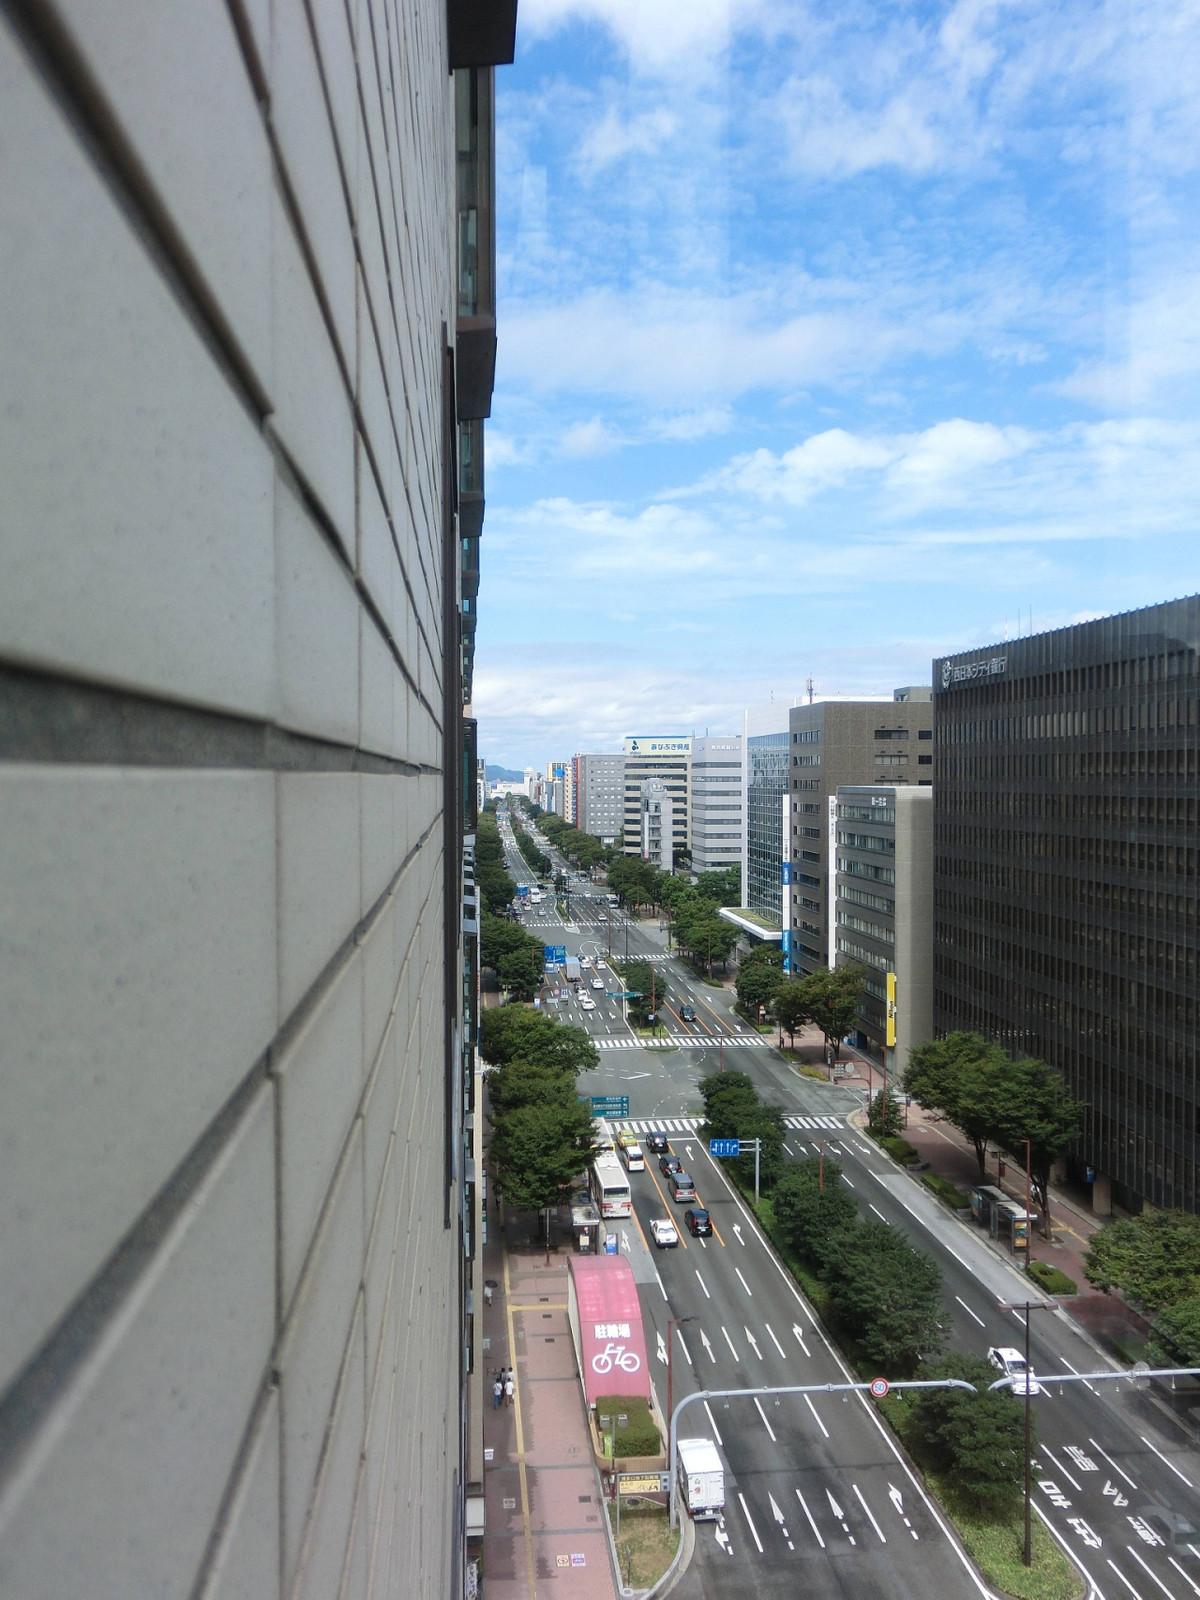 Nikko_fukuoka_11f_window_view_tai_6